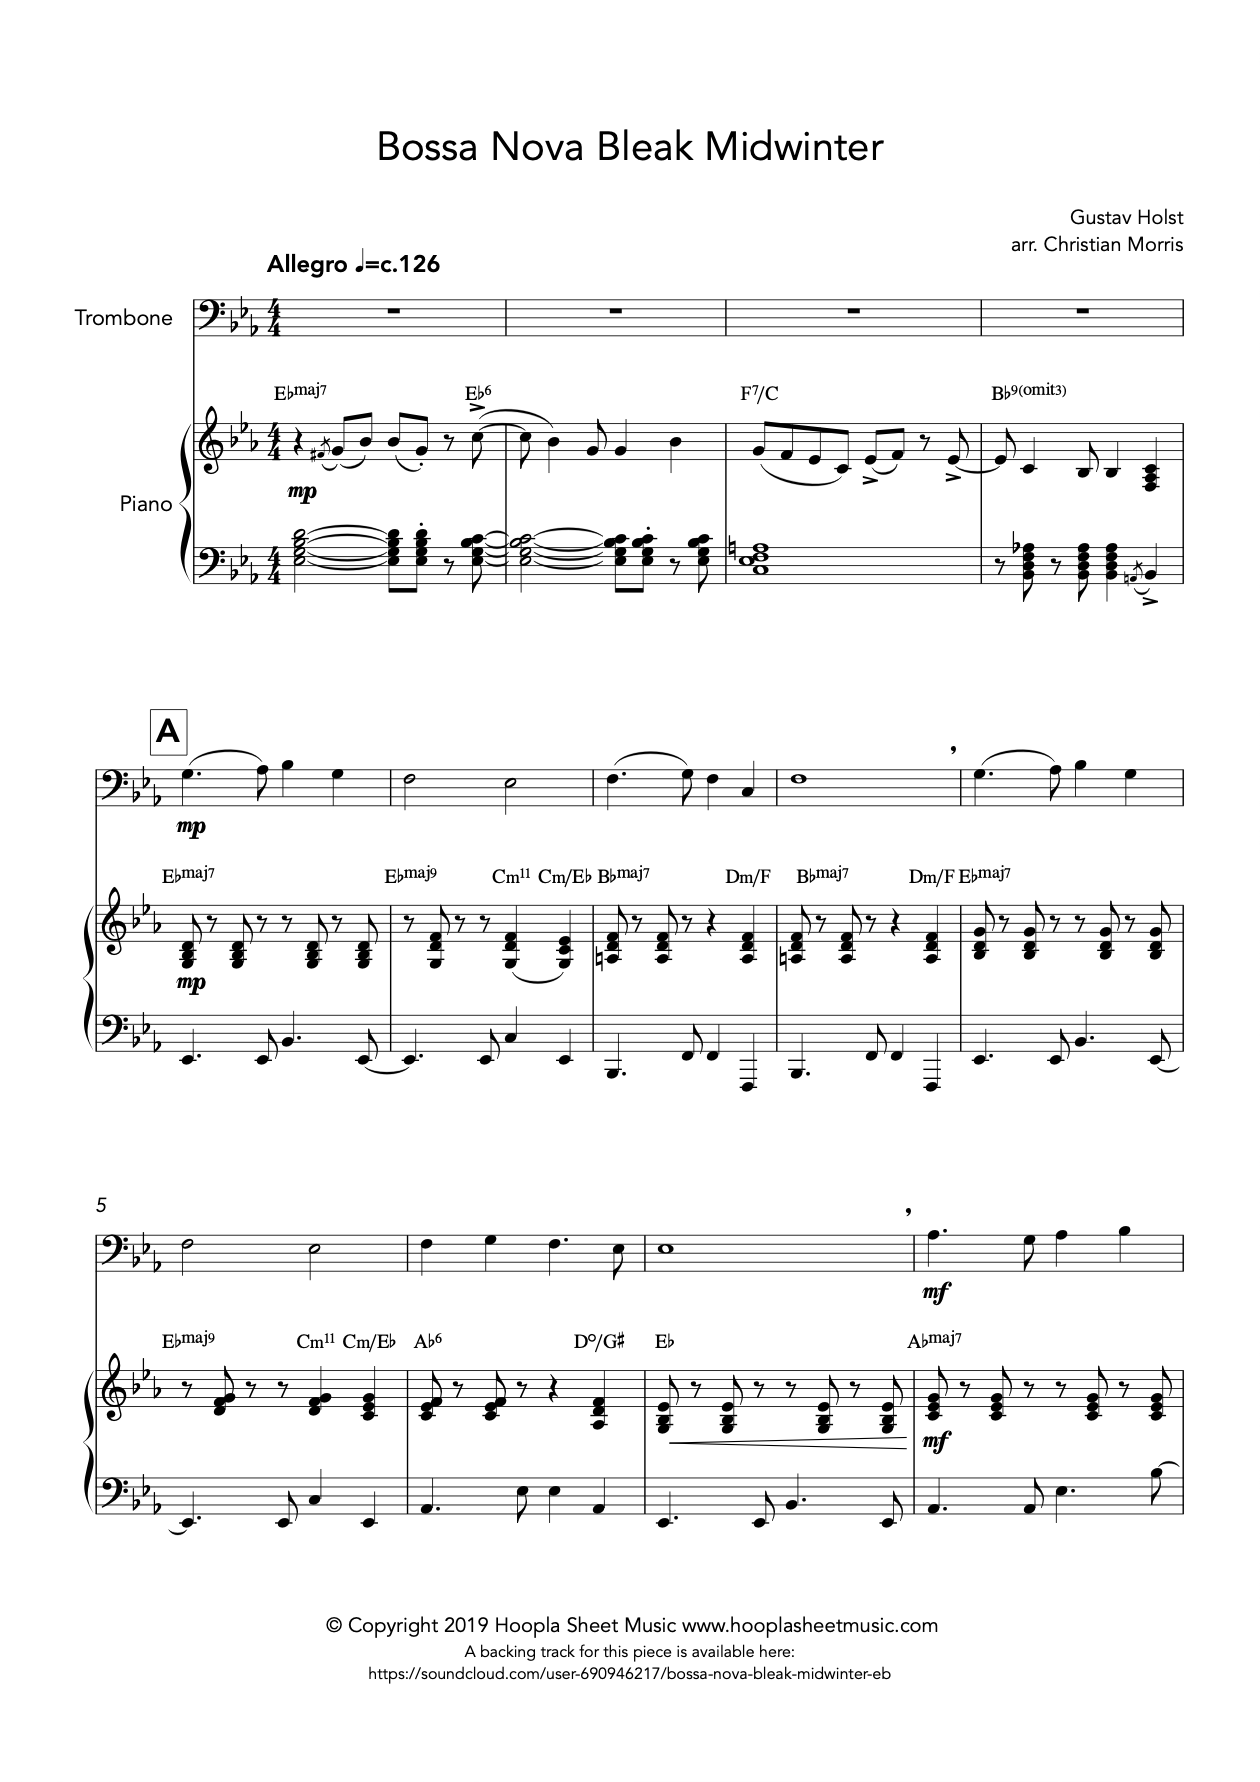 Bossa Nova Bleak Midwinter (Trombone)